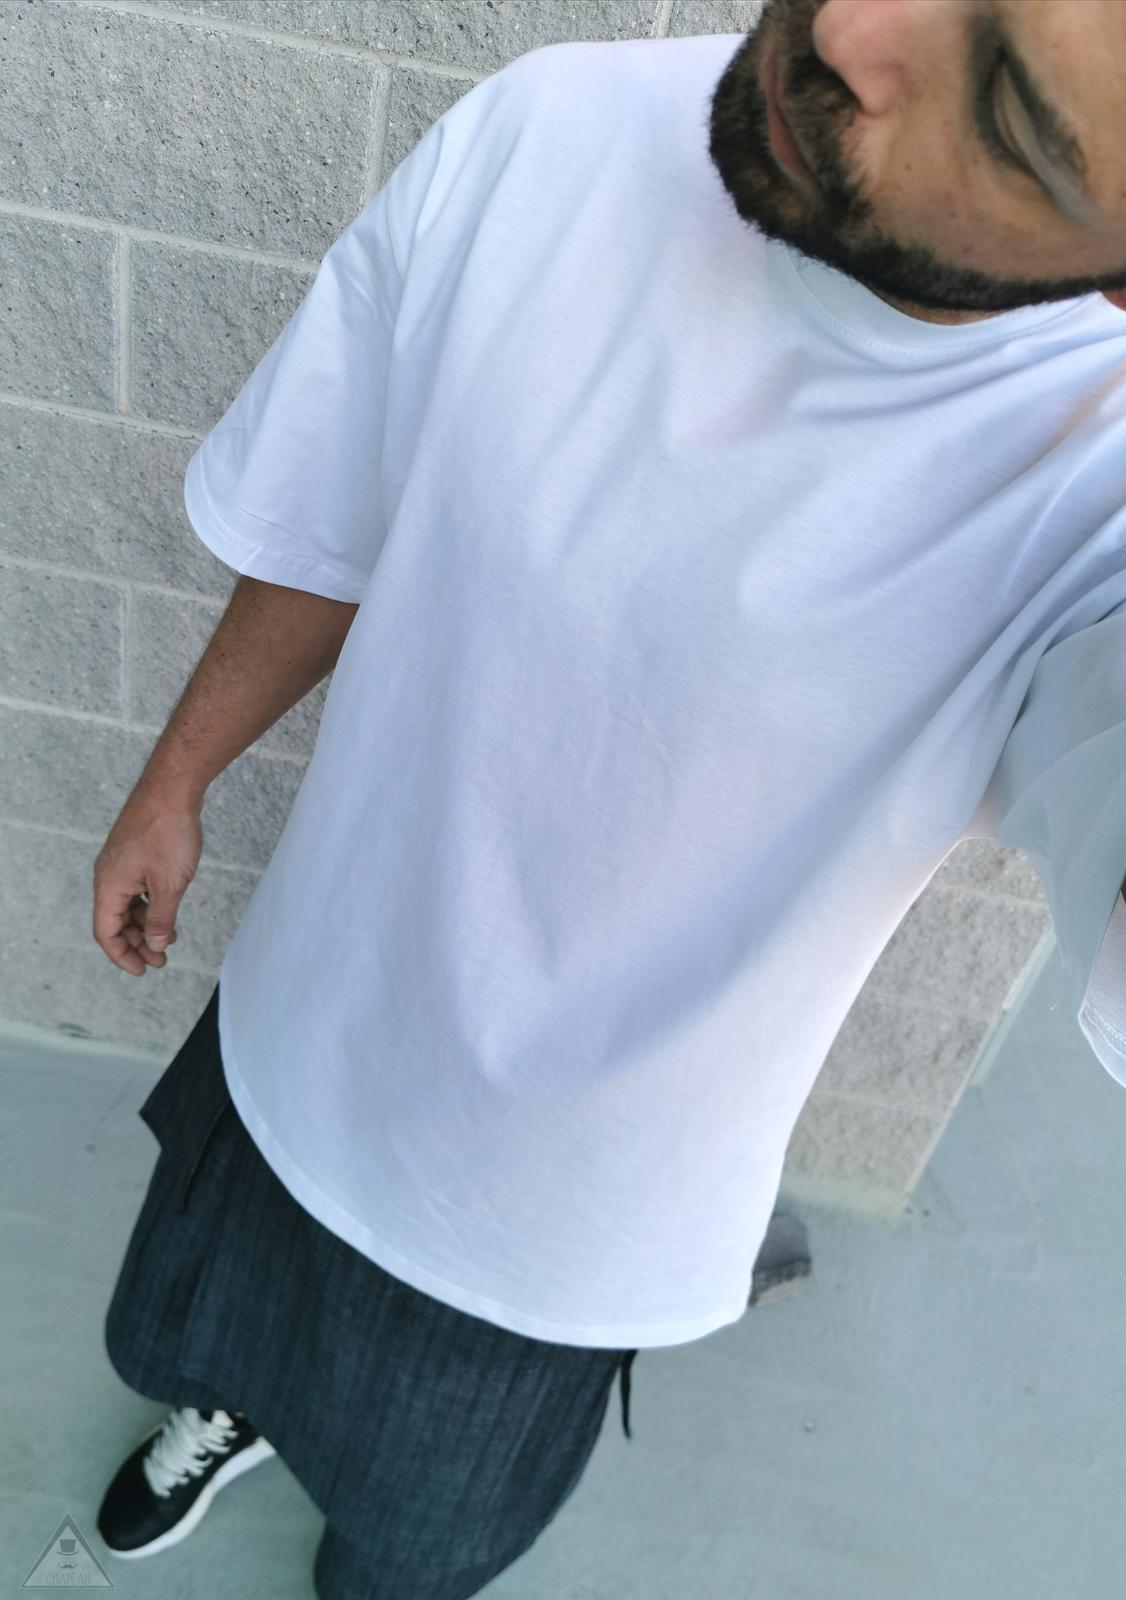 T-shirt over white